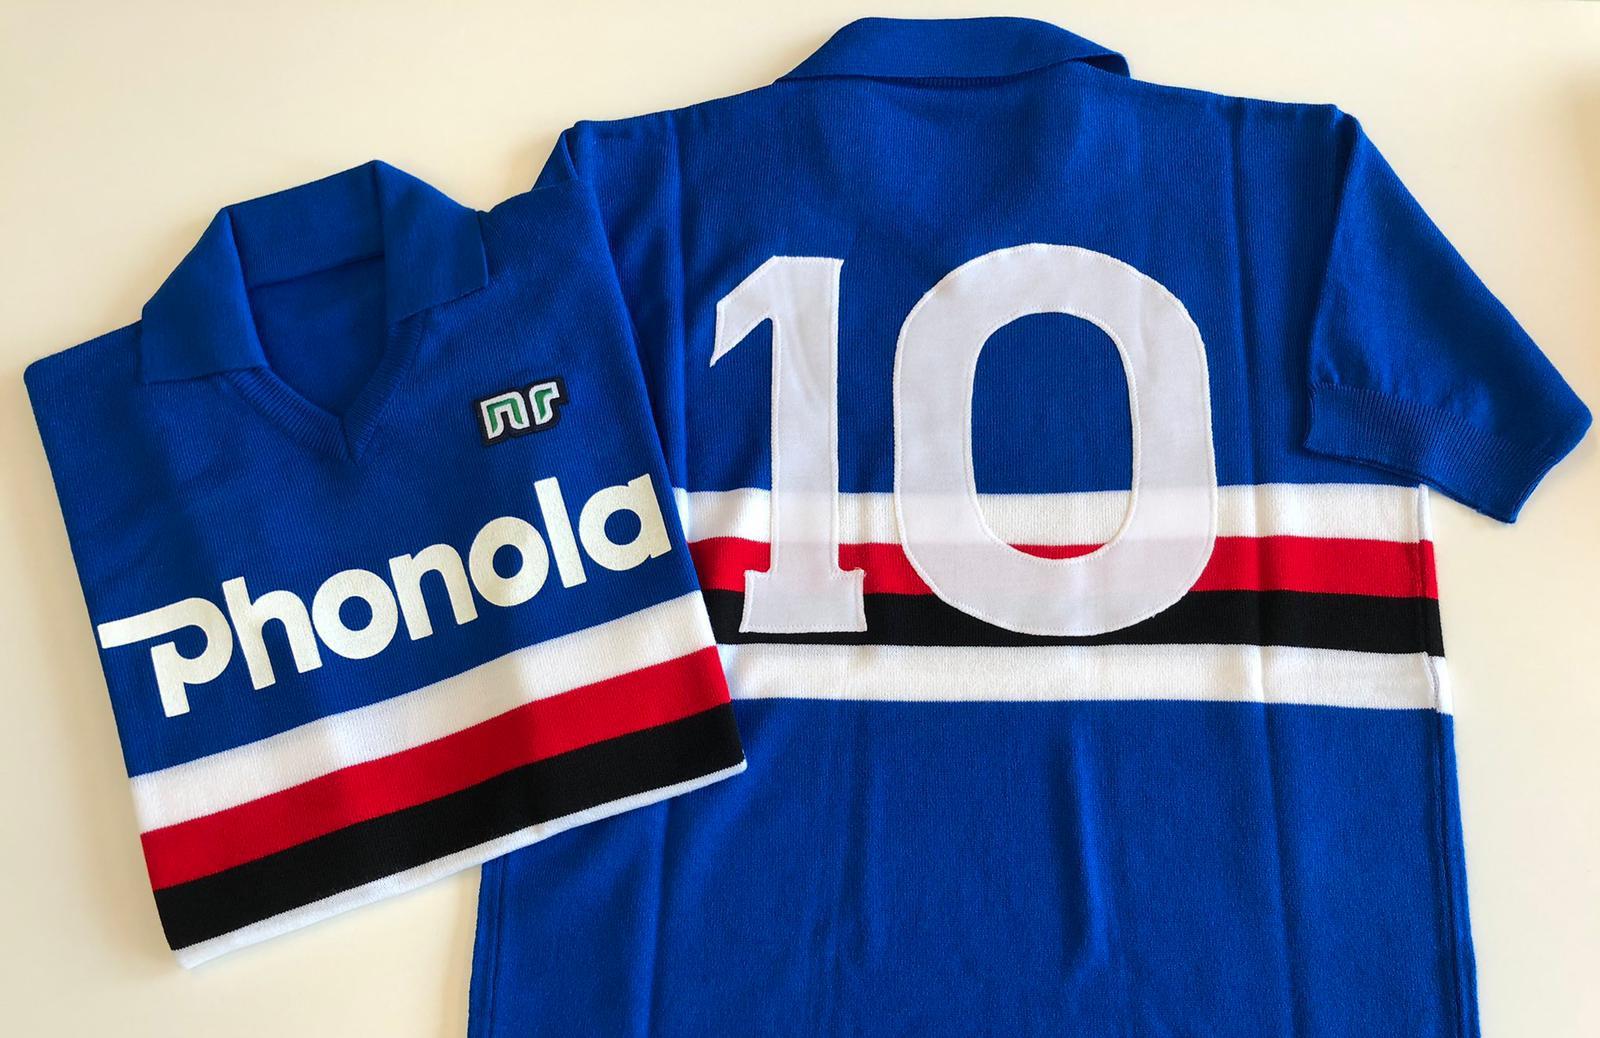 Het shirt van Sampdoria